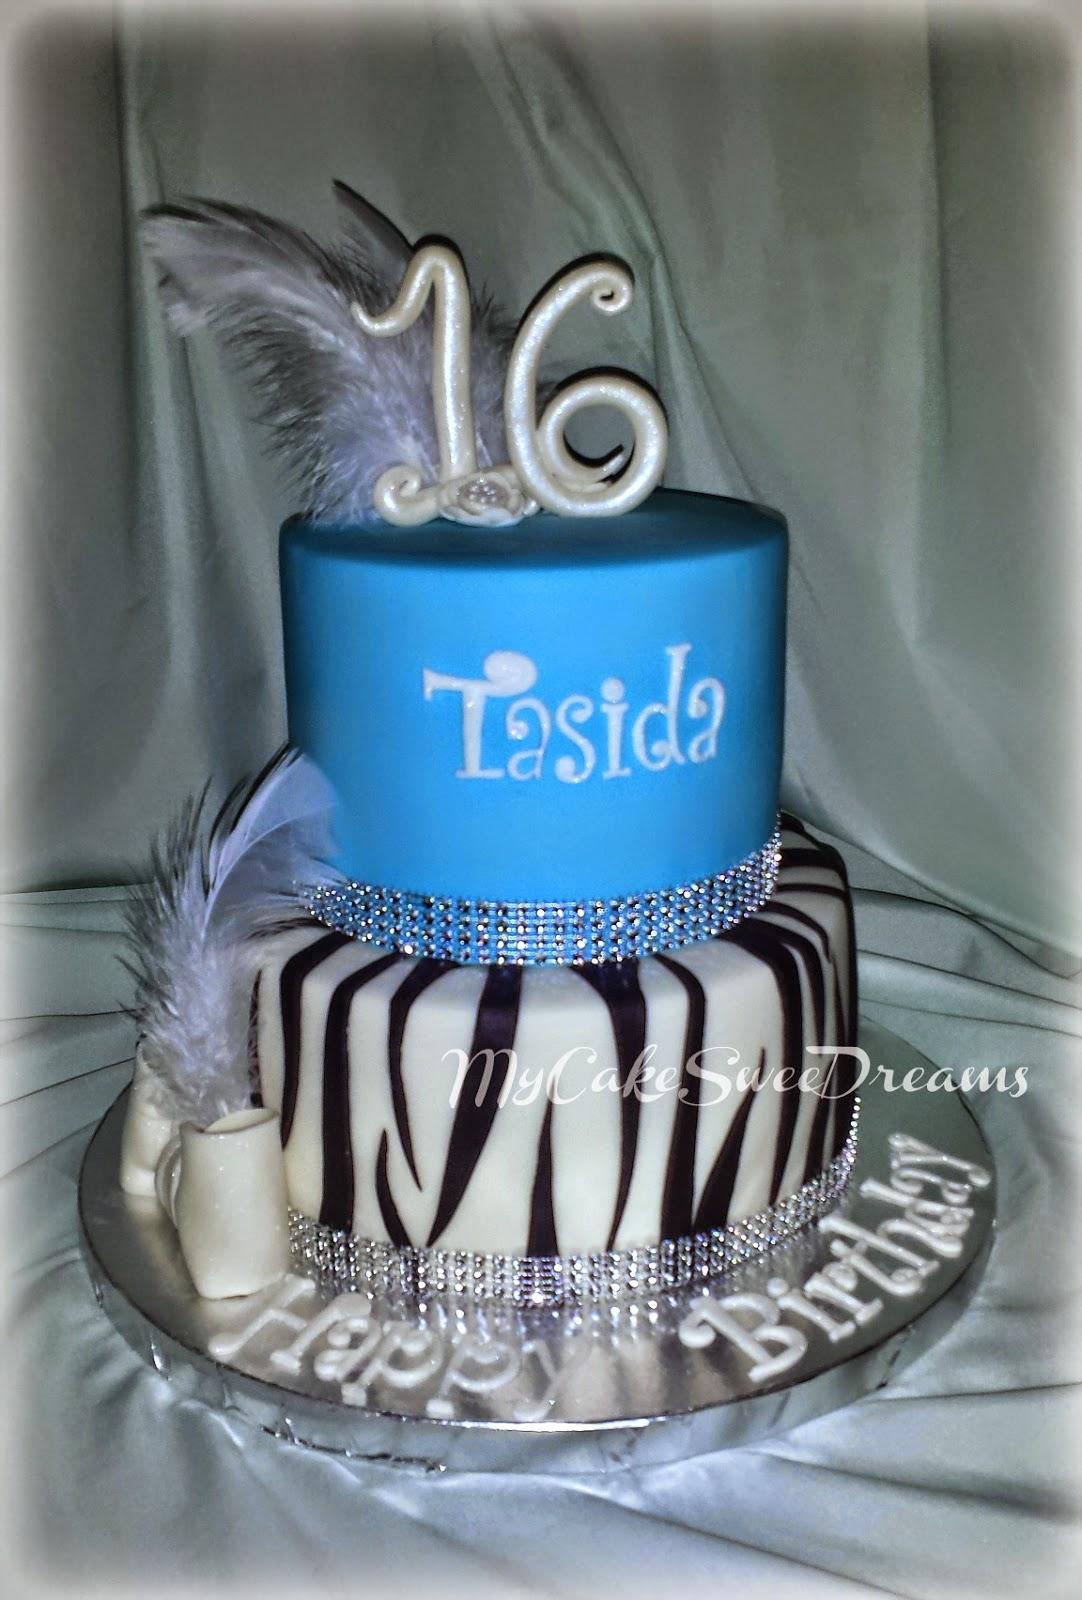 Mycakesweetdreams Sweet 16 Birthday Cake